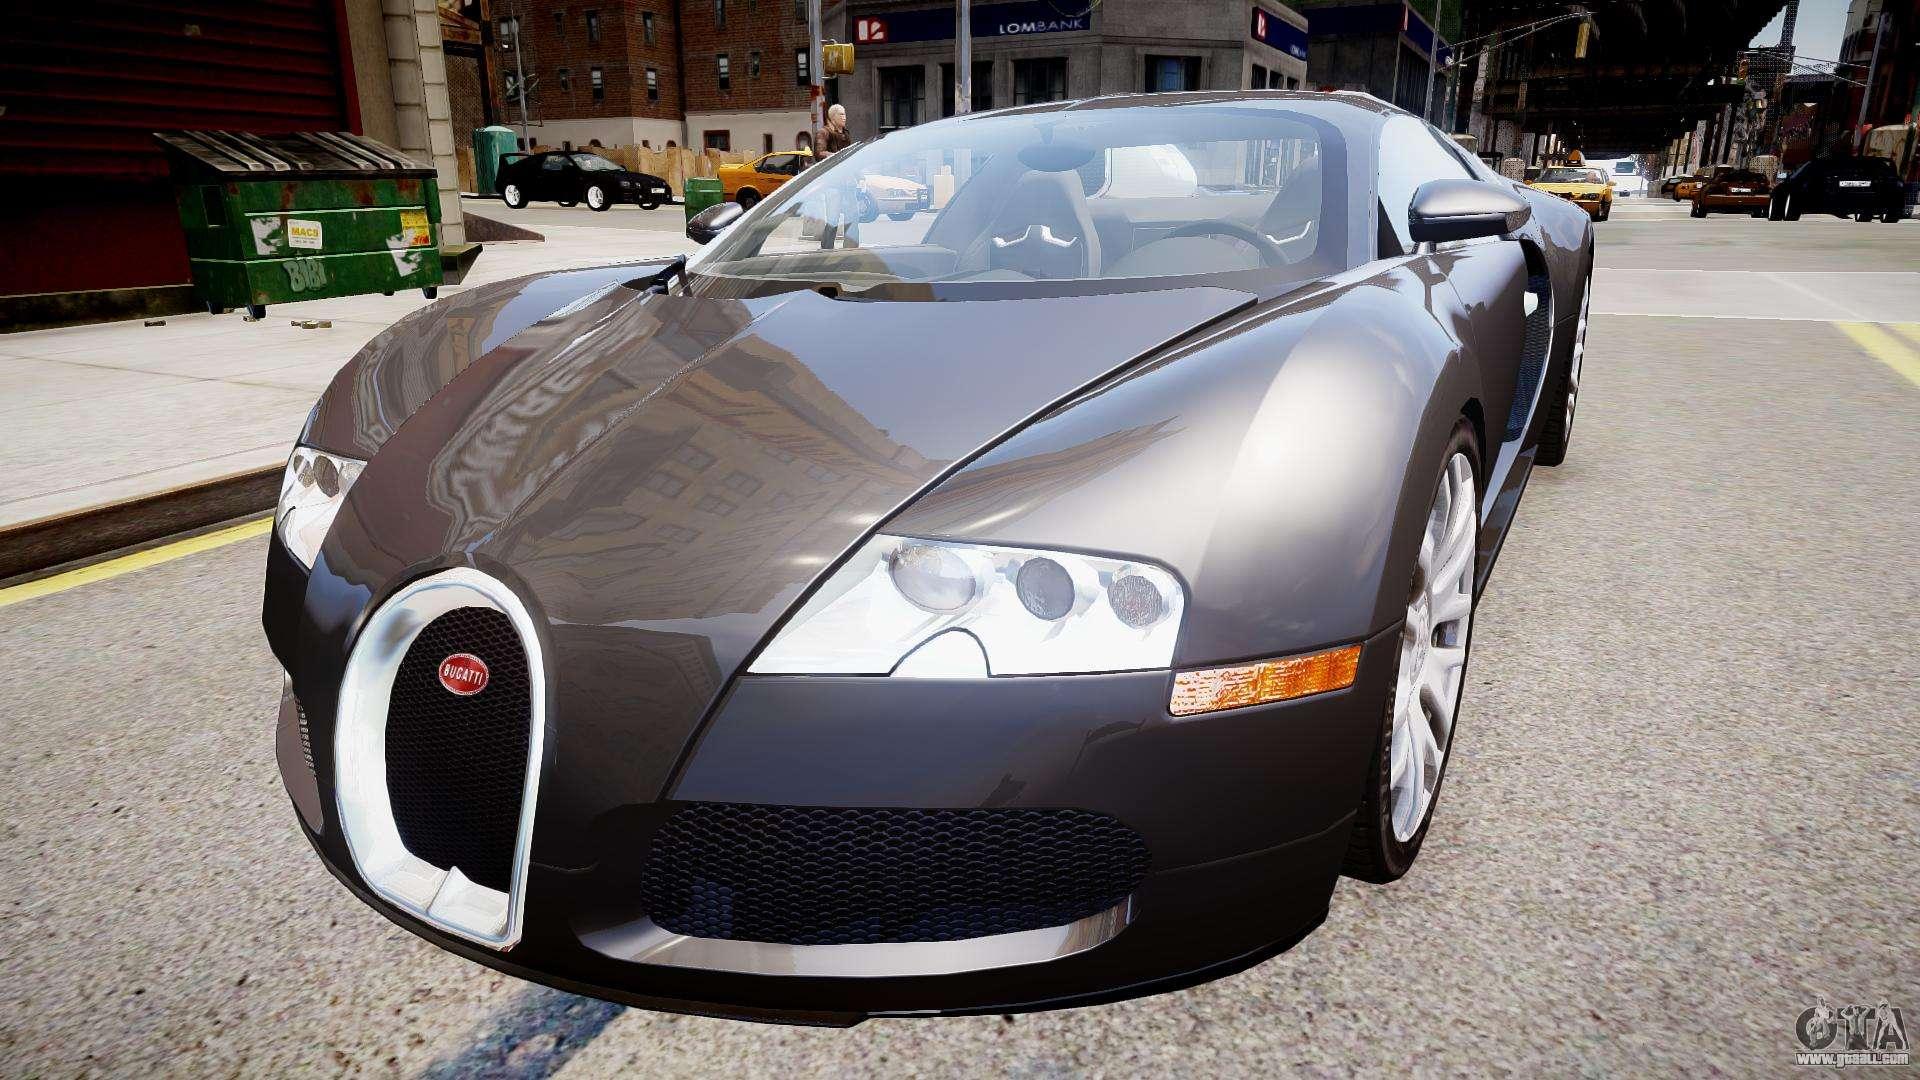 372626-GTAIV-2016-12-24-18-26-11-65 Wonderful Bugatti Veyron Xbox 360 Games Cars Trend